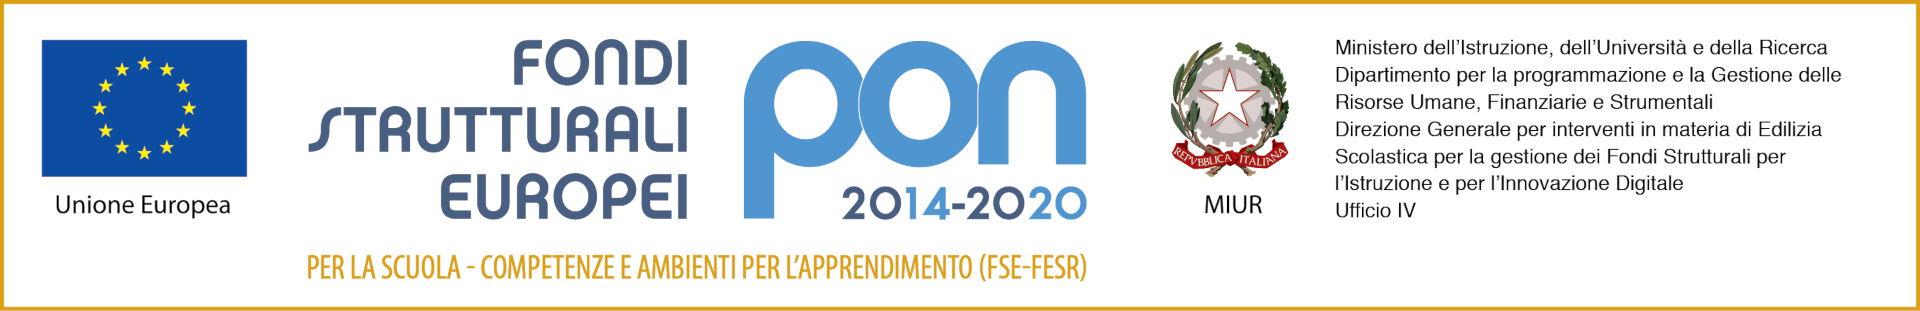 Loghi PON 2014 2020 fsefesr